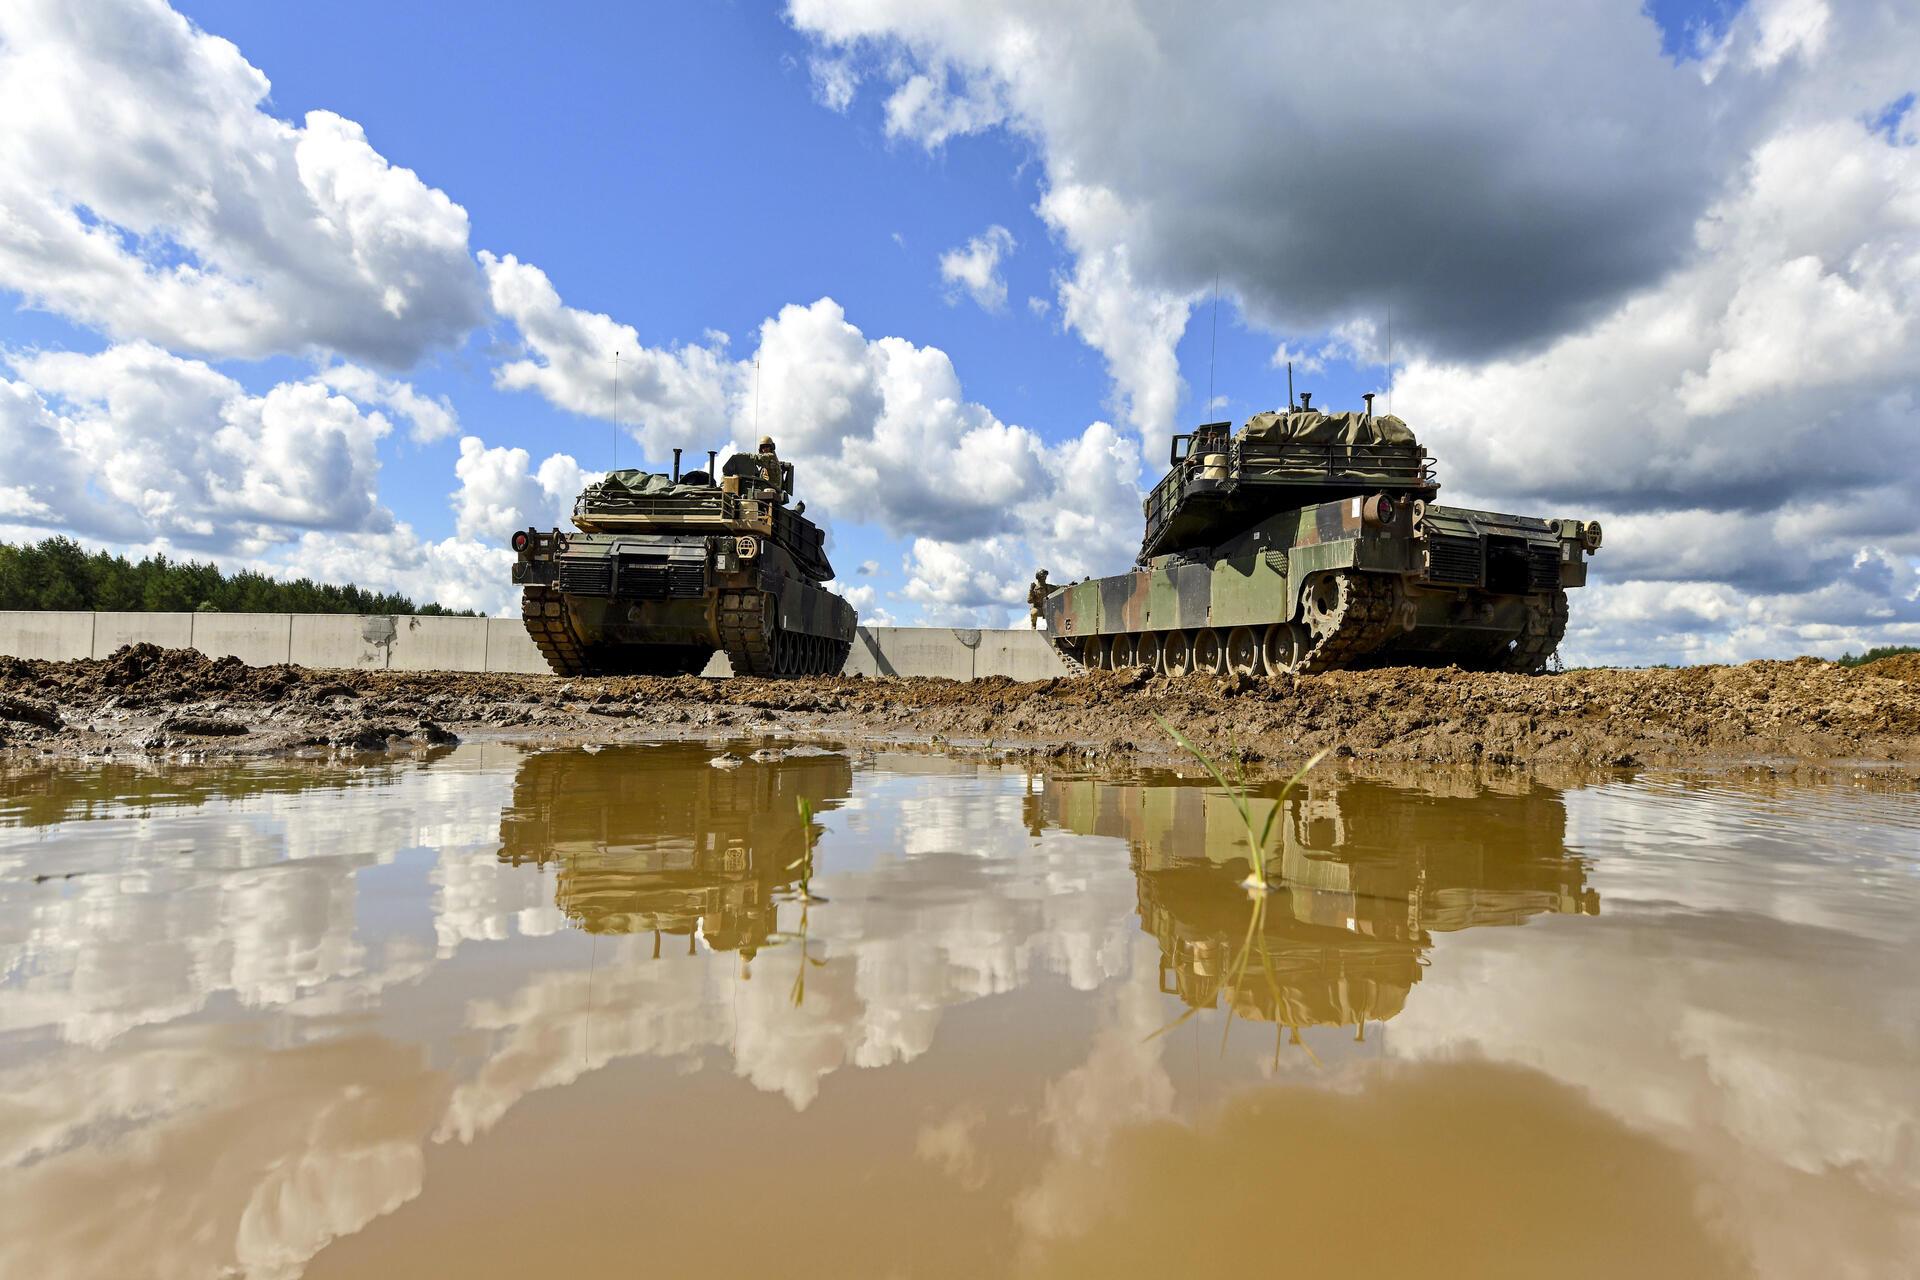 Photo U.S. Army, Jason Johnston